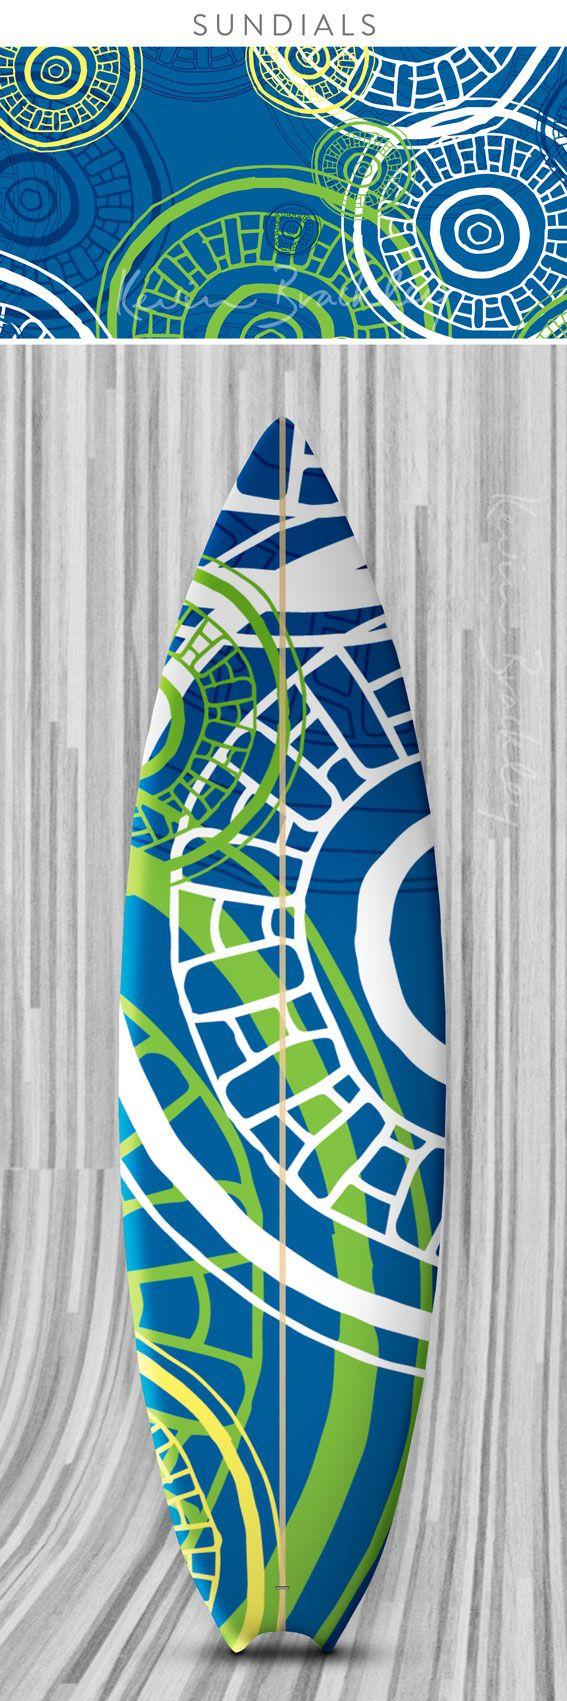 Surfboard concept in my Sundials design